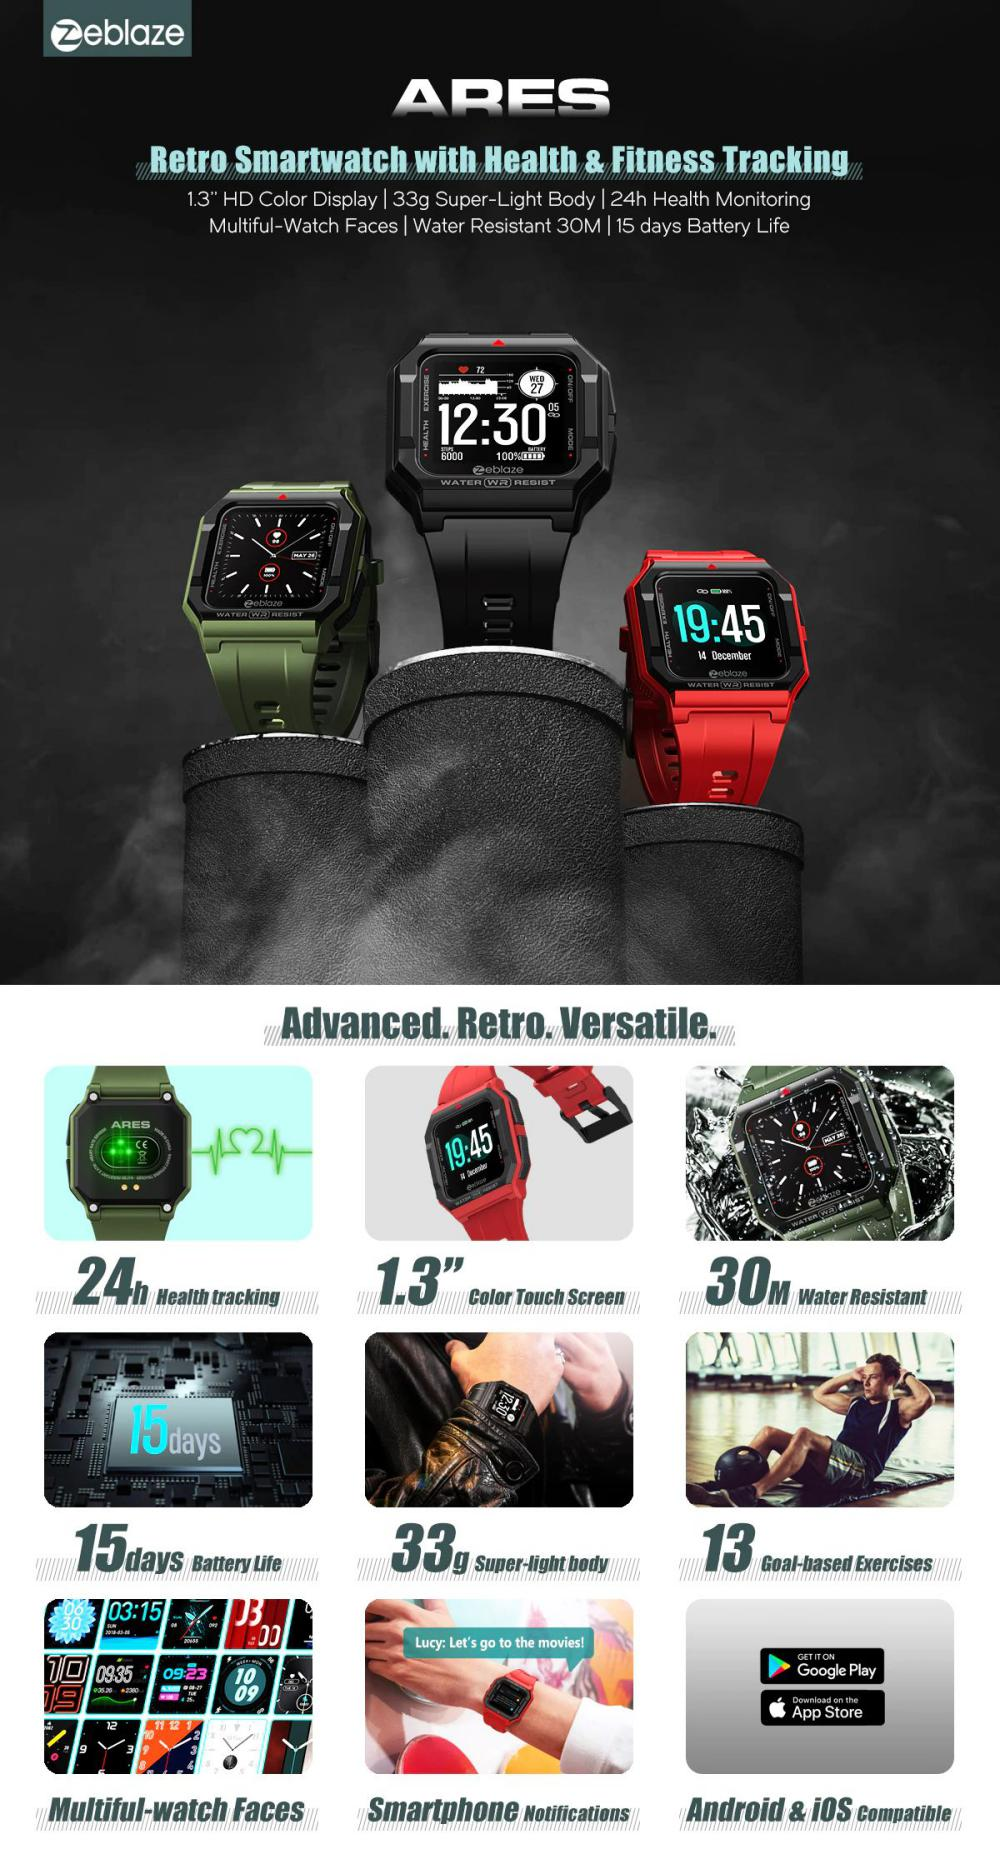 Zeblaze Ares Smart Watch Bluetooth 5 1 Heart Rate Tracking Smartwatch (9)